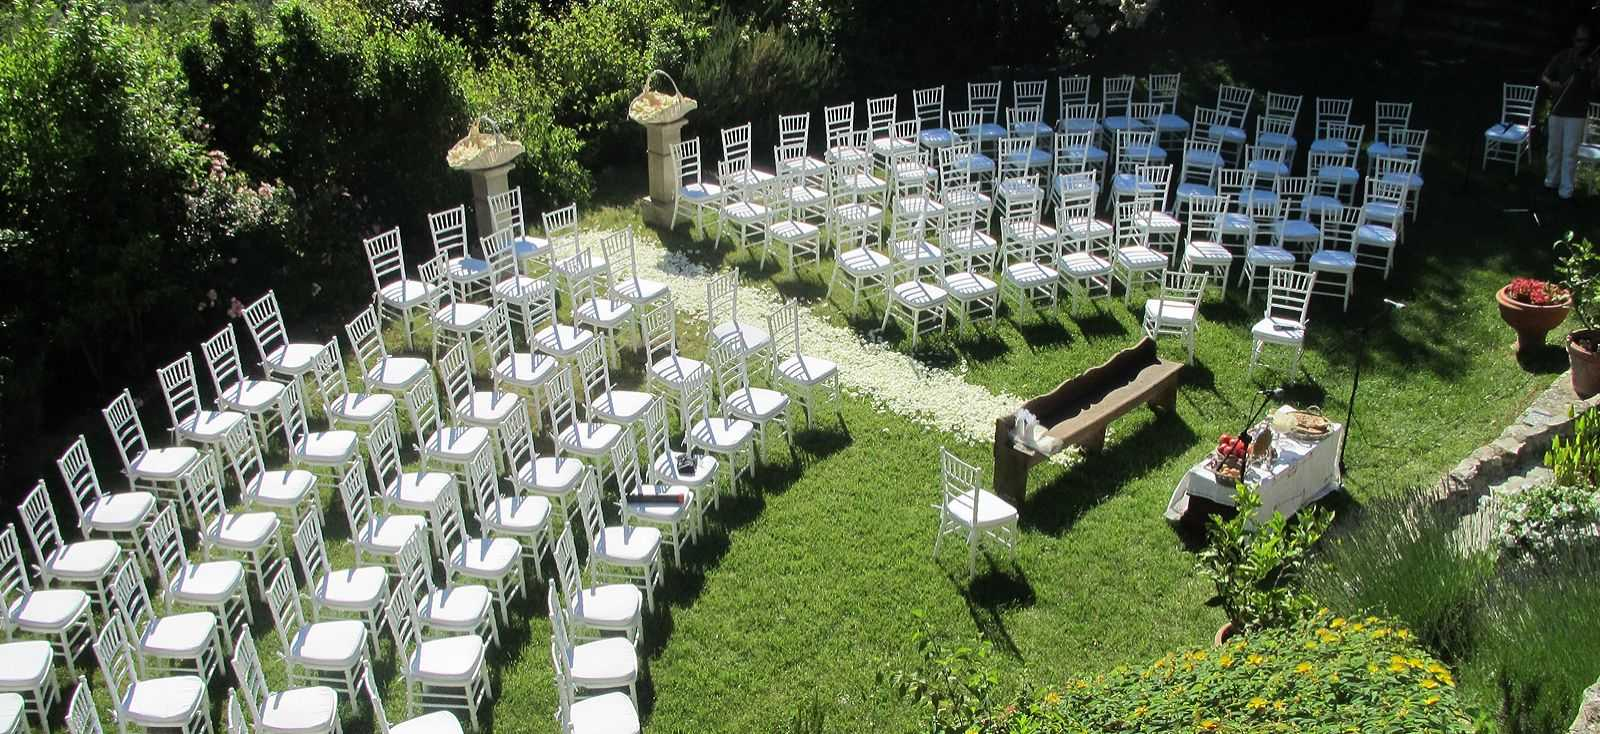 Weddings gardens in Italy